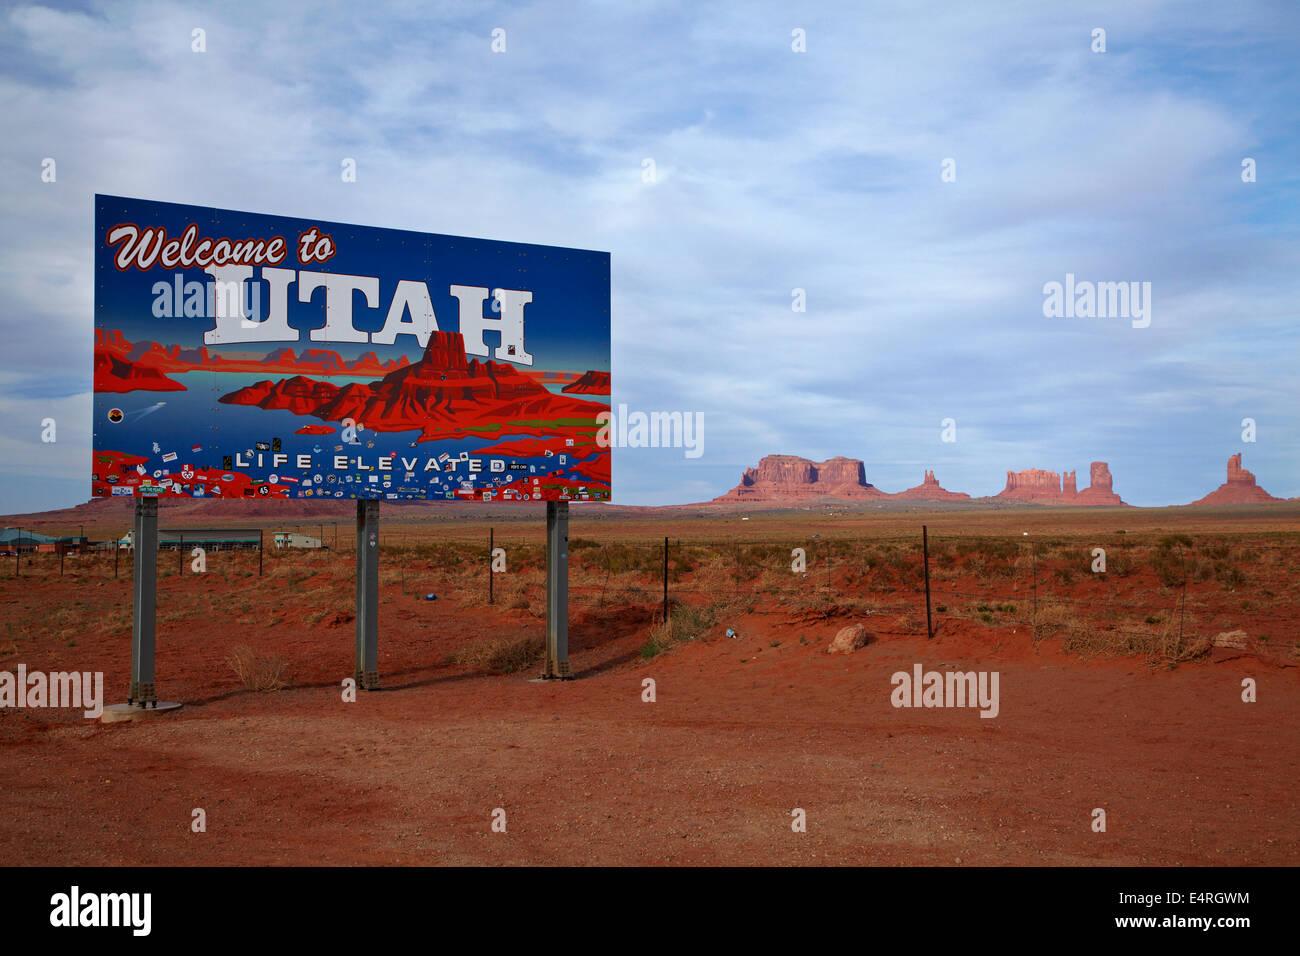 Welcome to Utah sign, Monument Valley, Navajo Nation, Utah/Arizona Border, USA - Stock Image